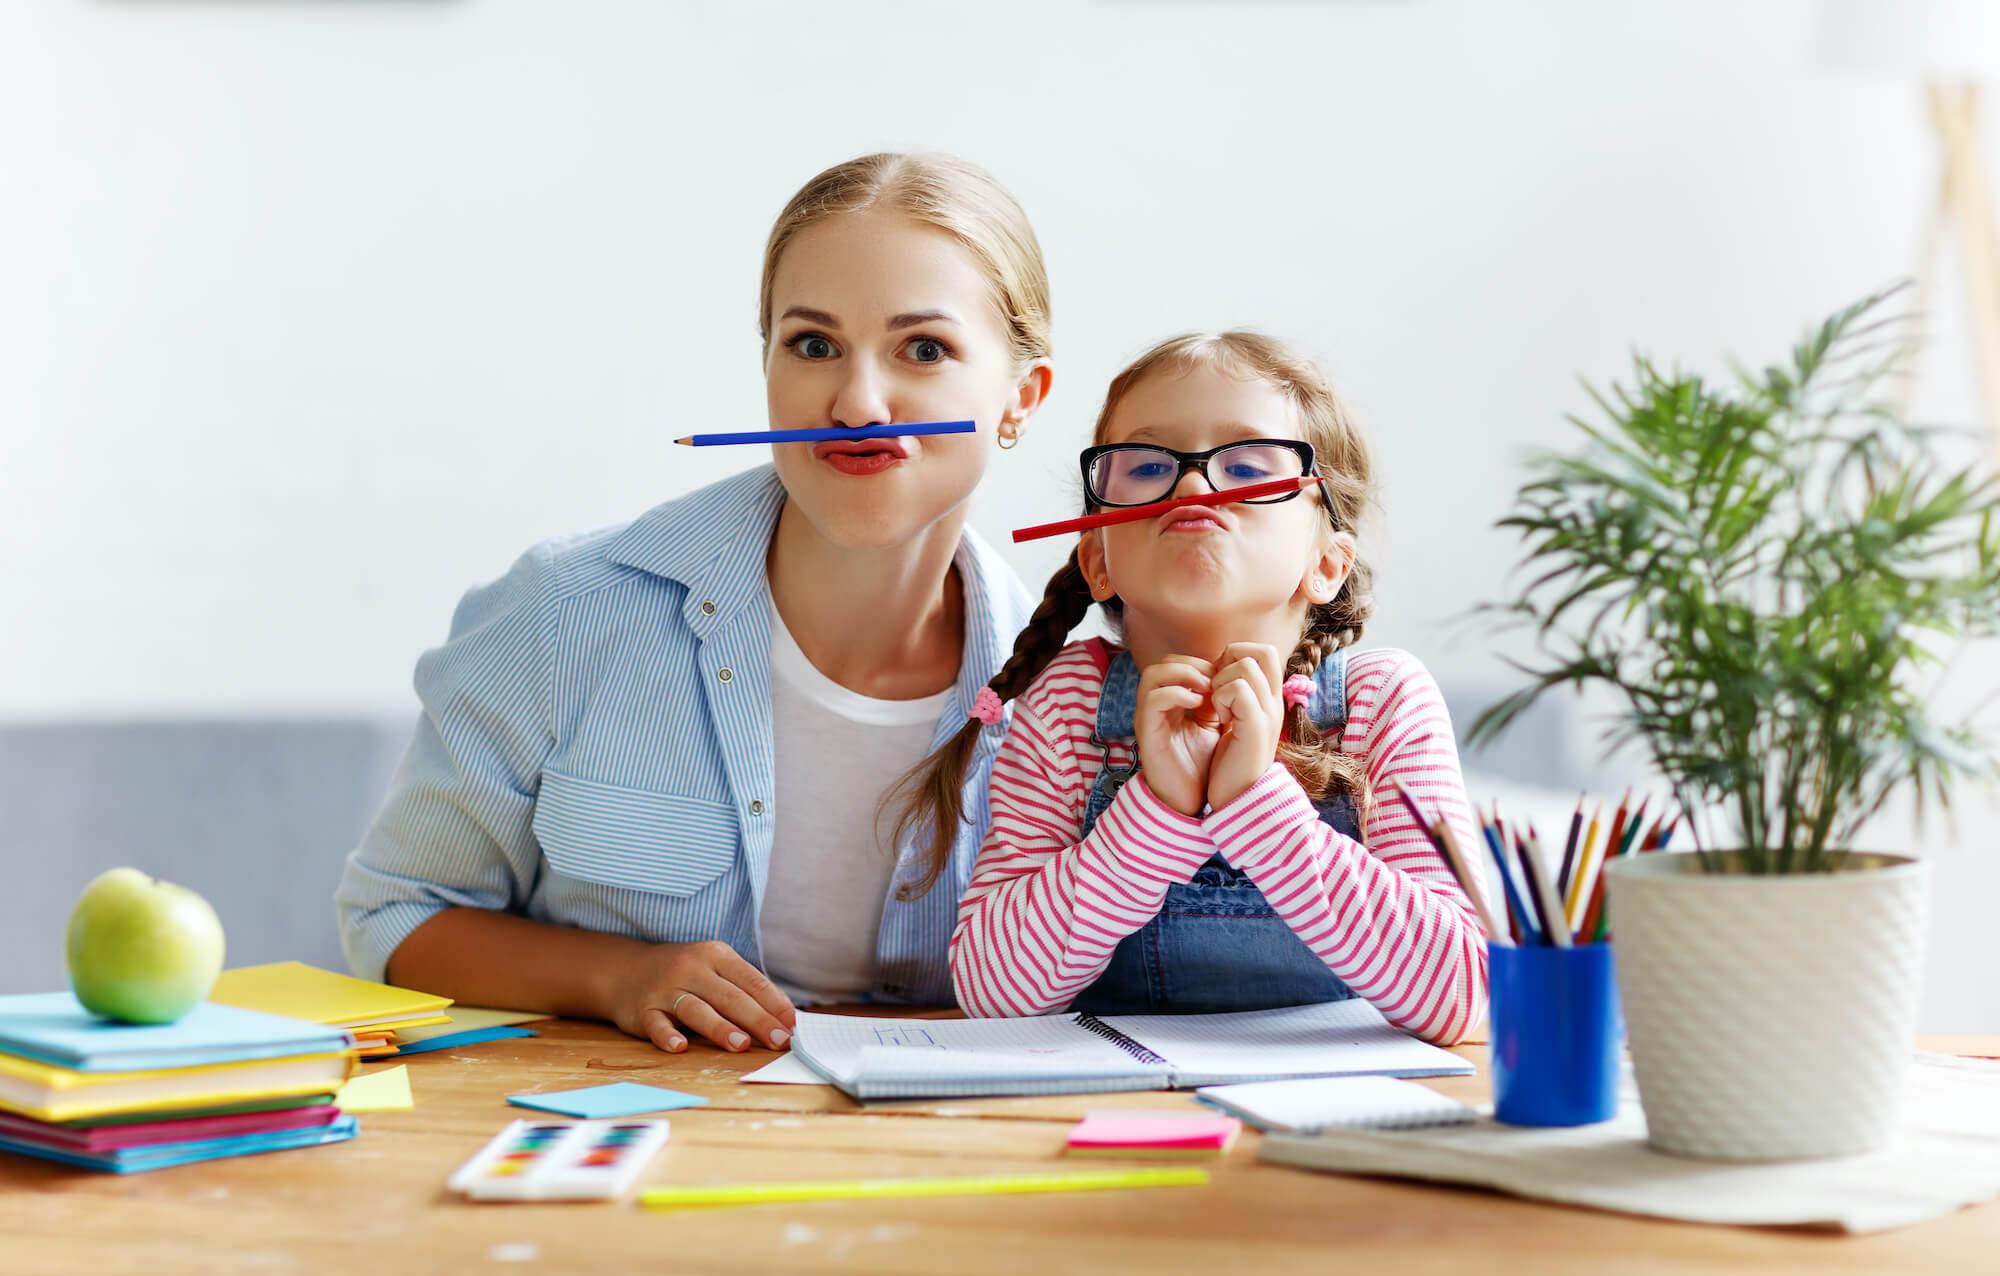 https://f.hubspotusercontent30.net/hubfs/14500231/Imported_Blog_Media/mother-and-daughter-1.jpg